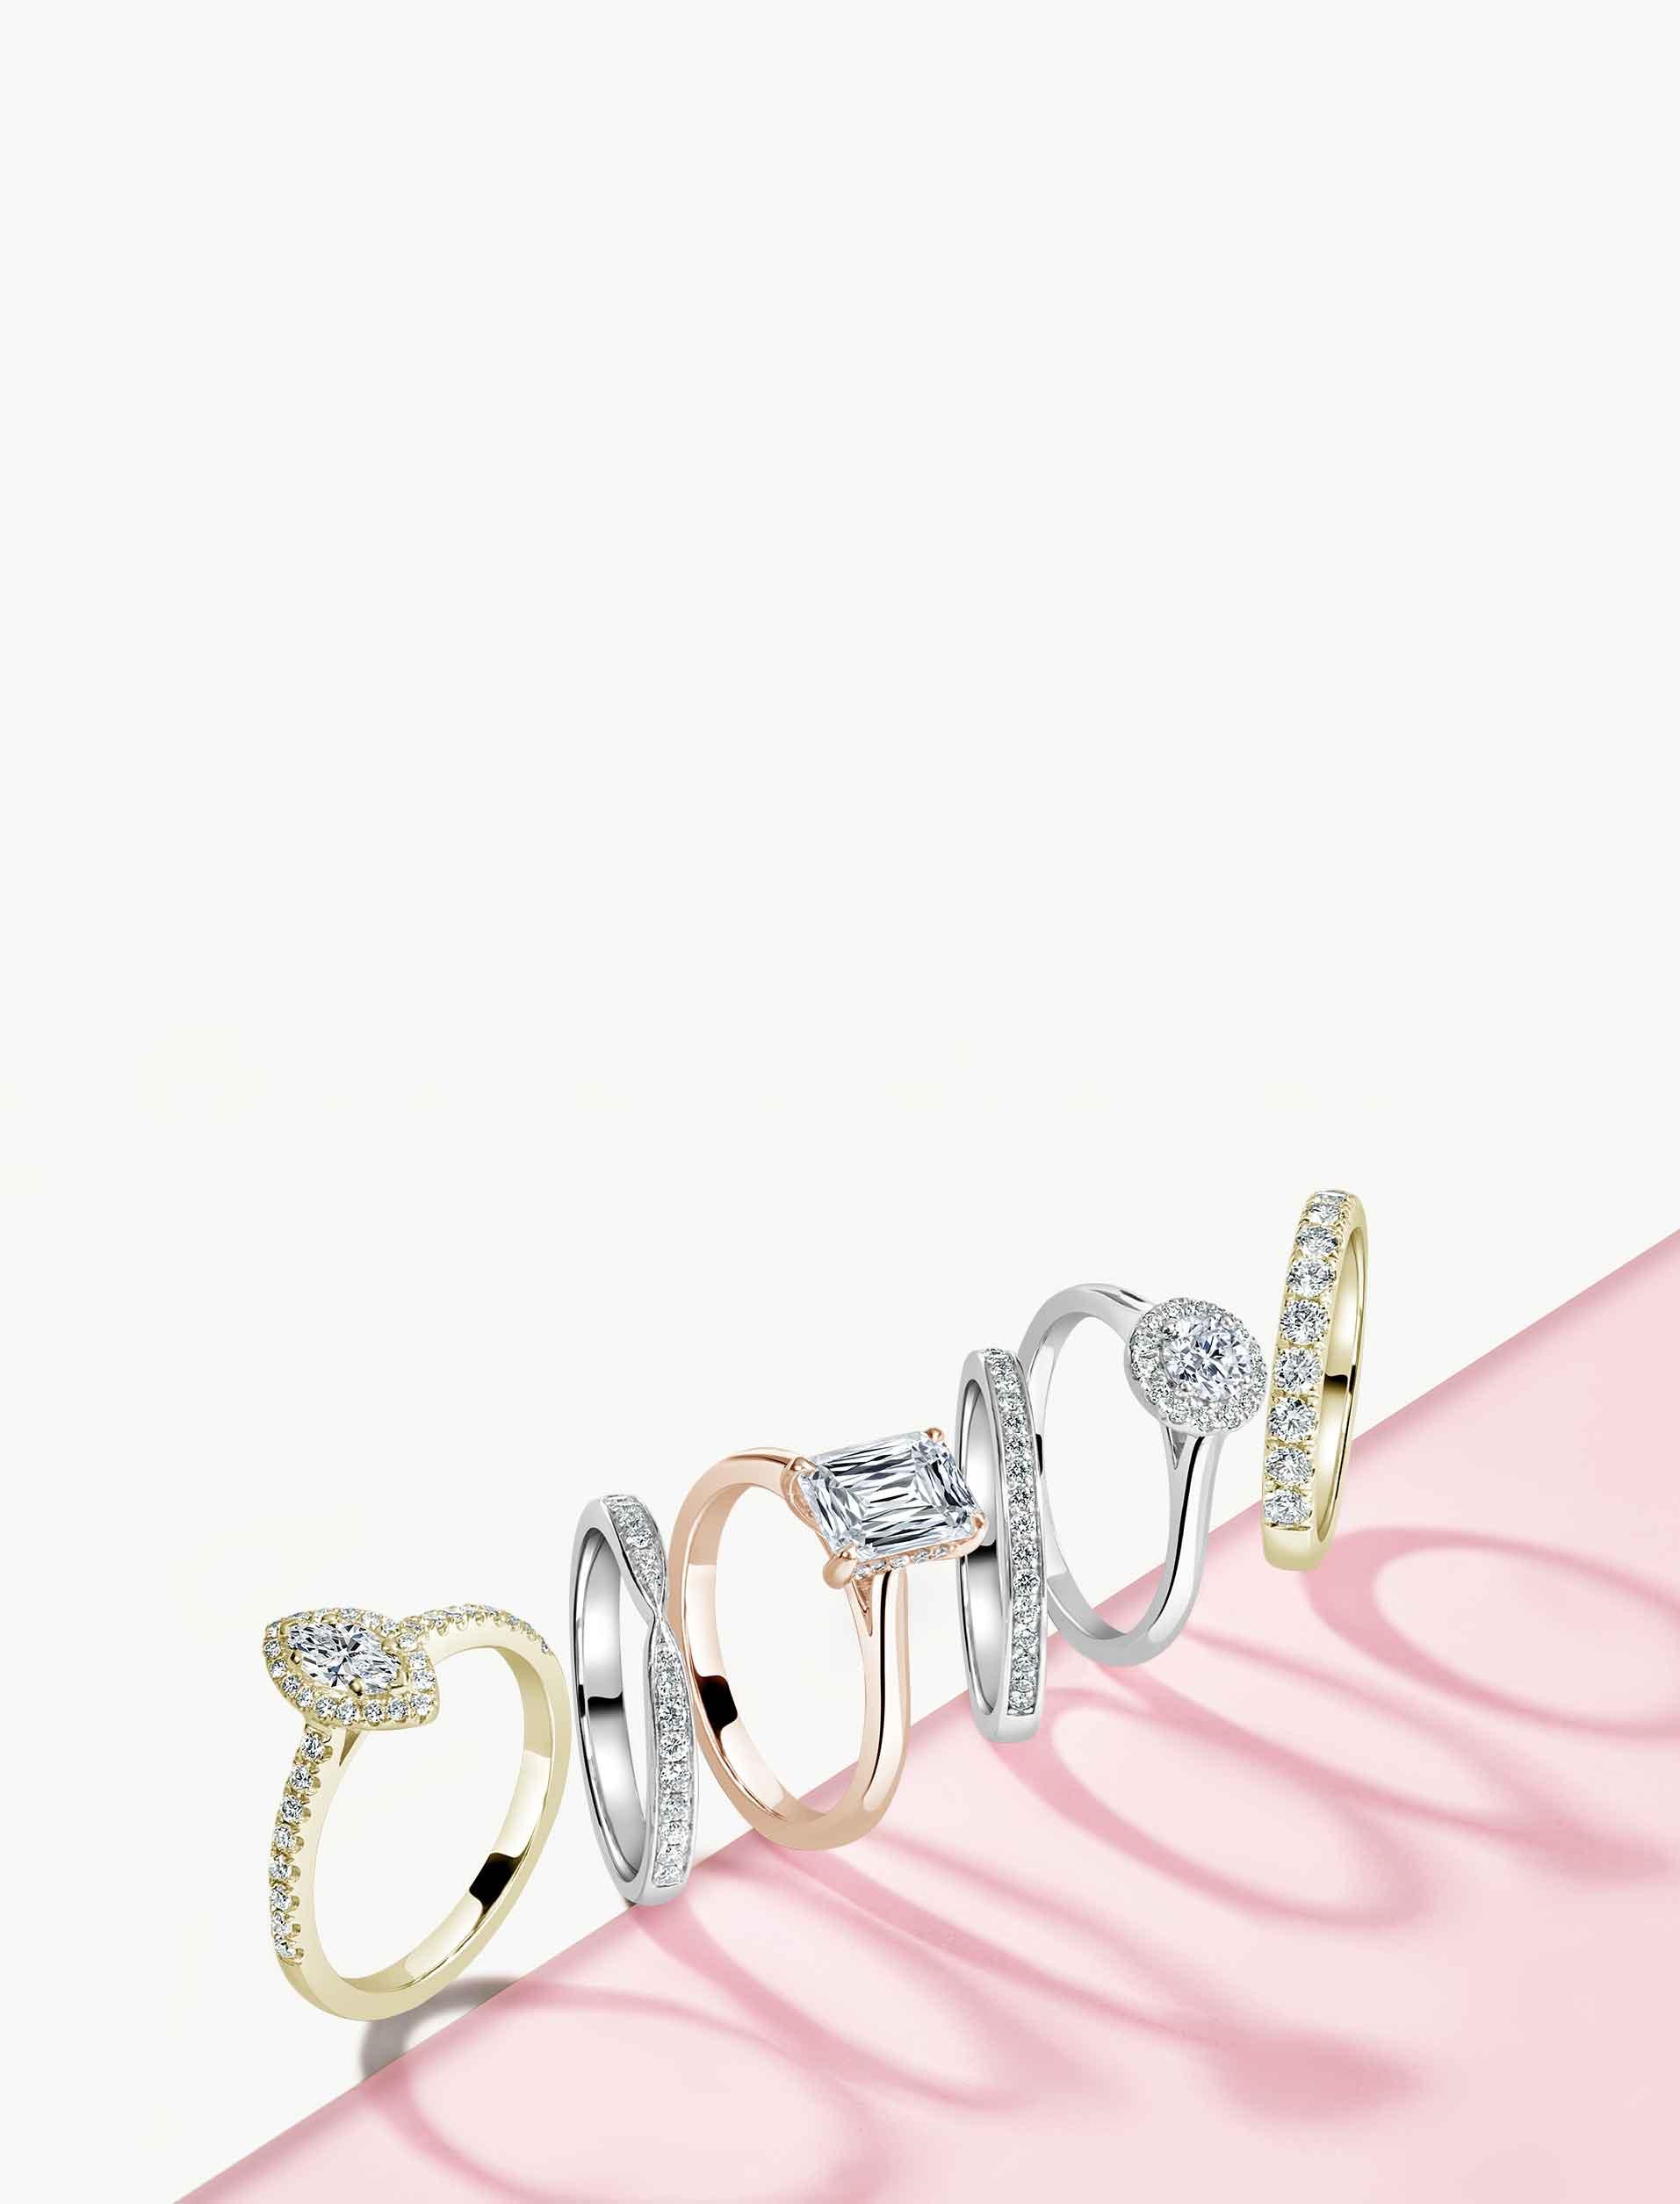 Platinum Marquise Cut Engagement Rings - Steven Stone